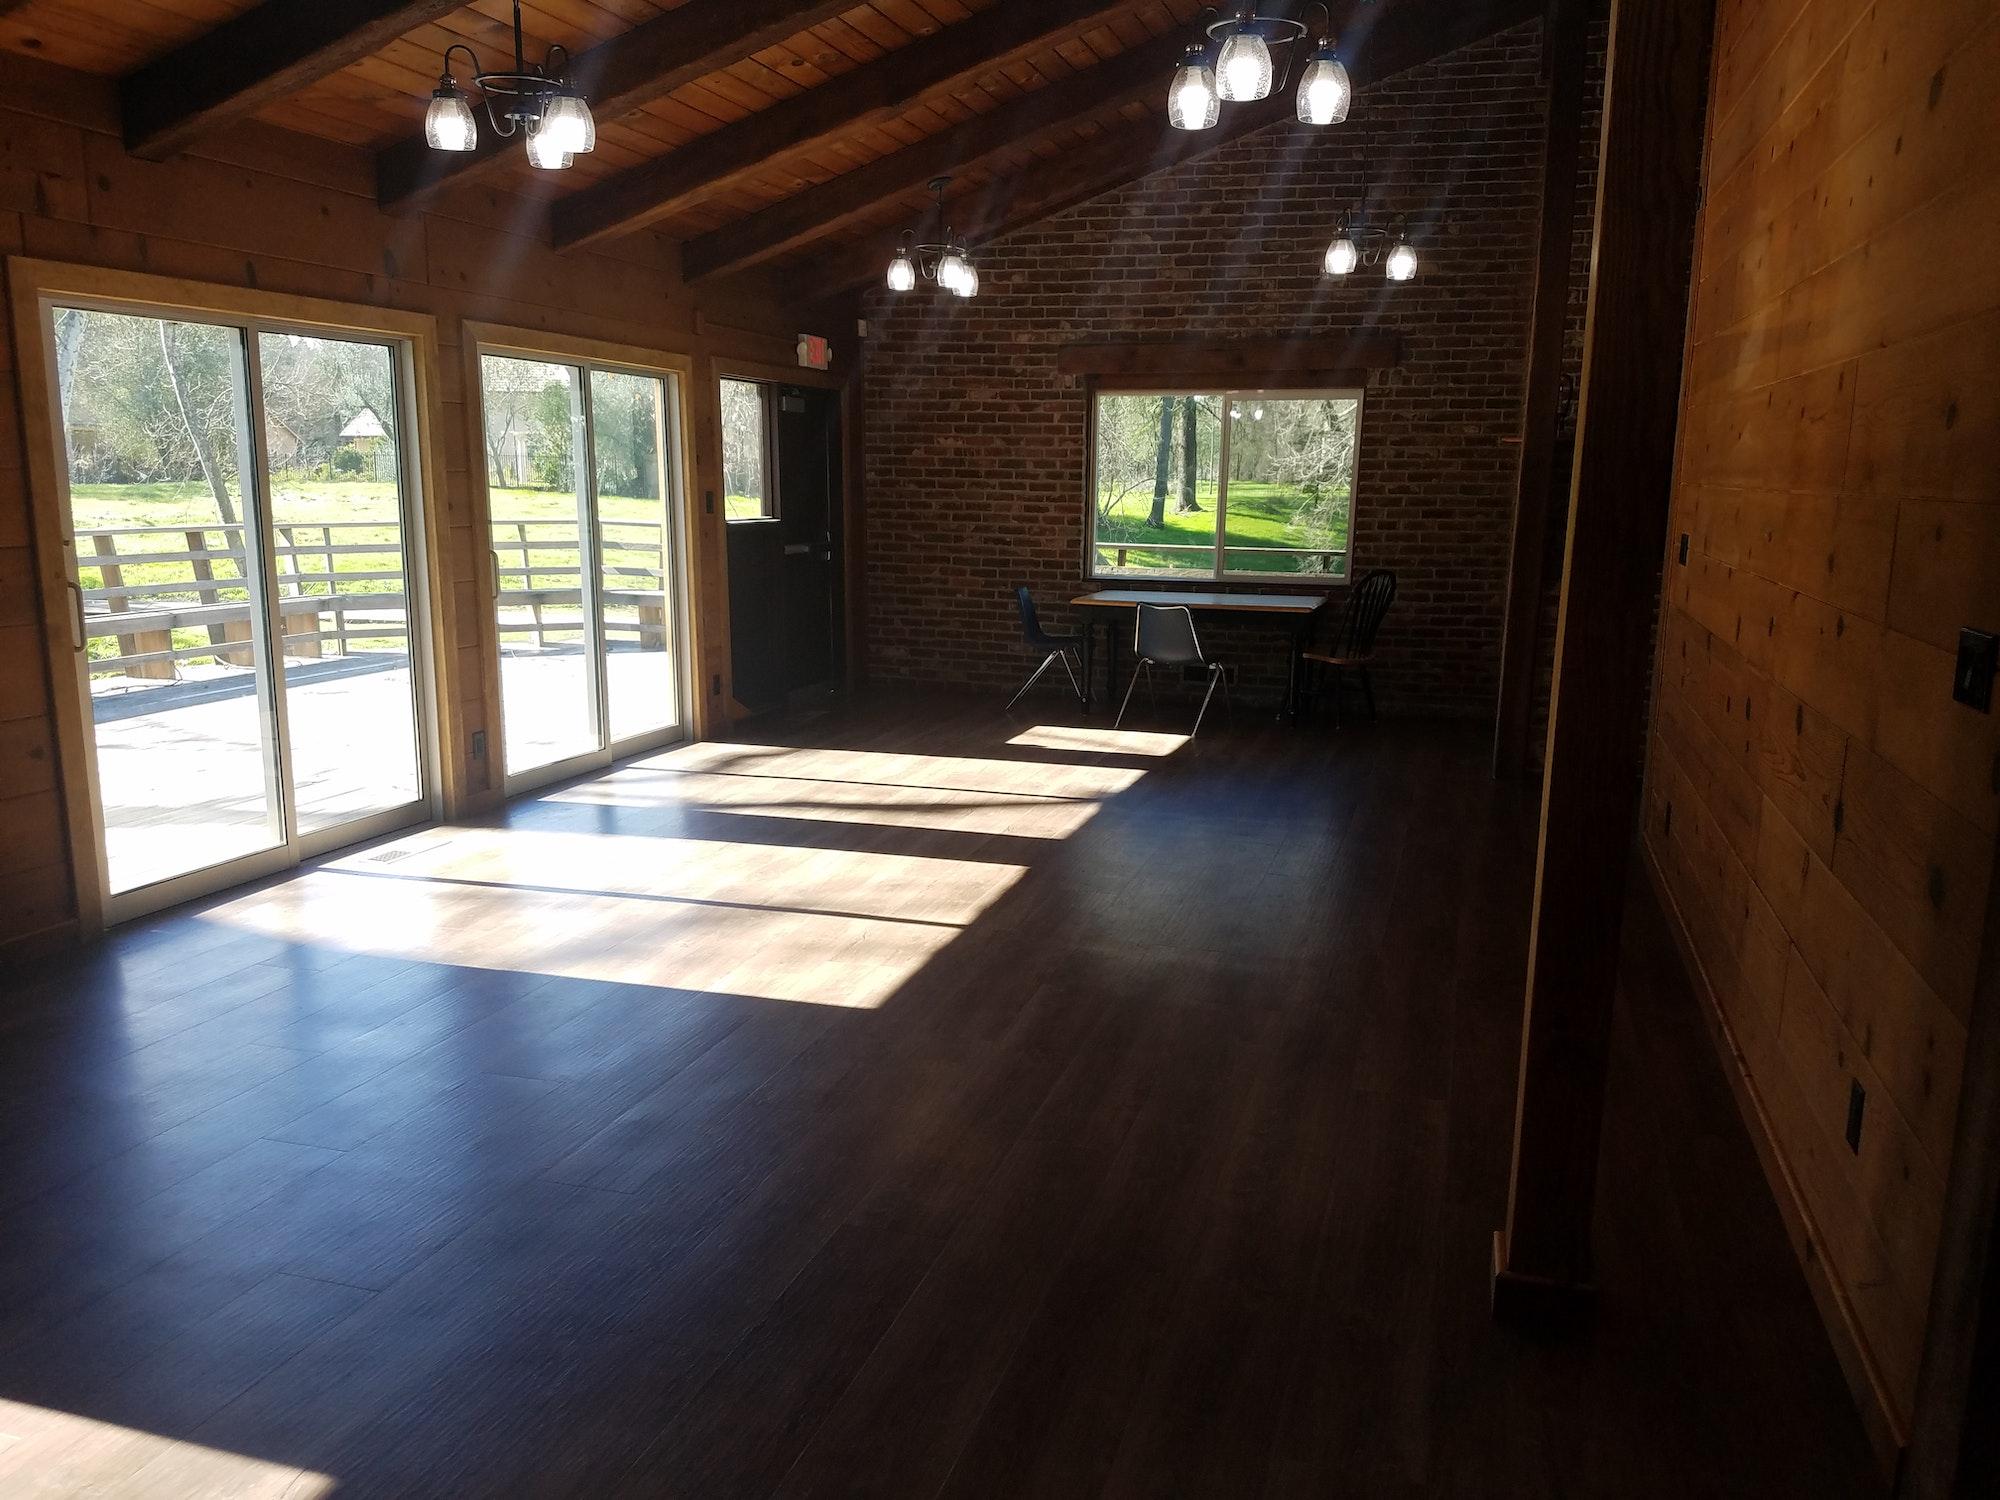 May contain: flooring, floor, wood, housing, building, hardwood, loft, and indoors